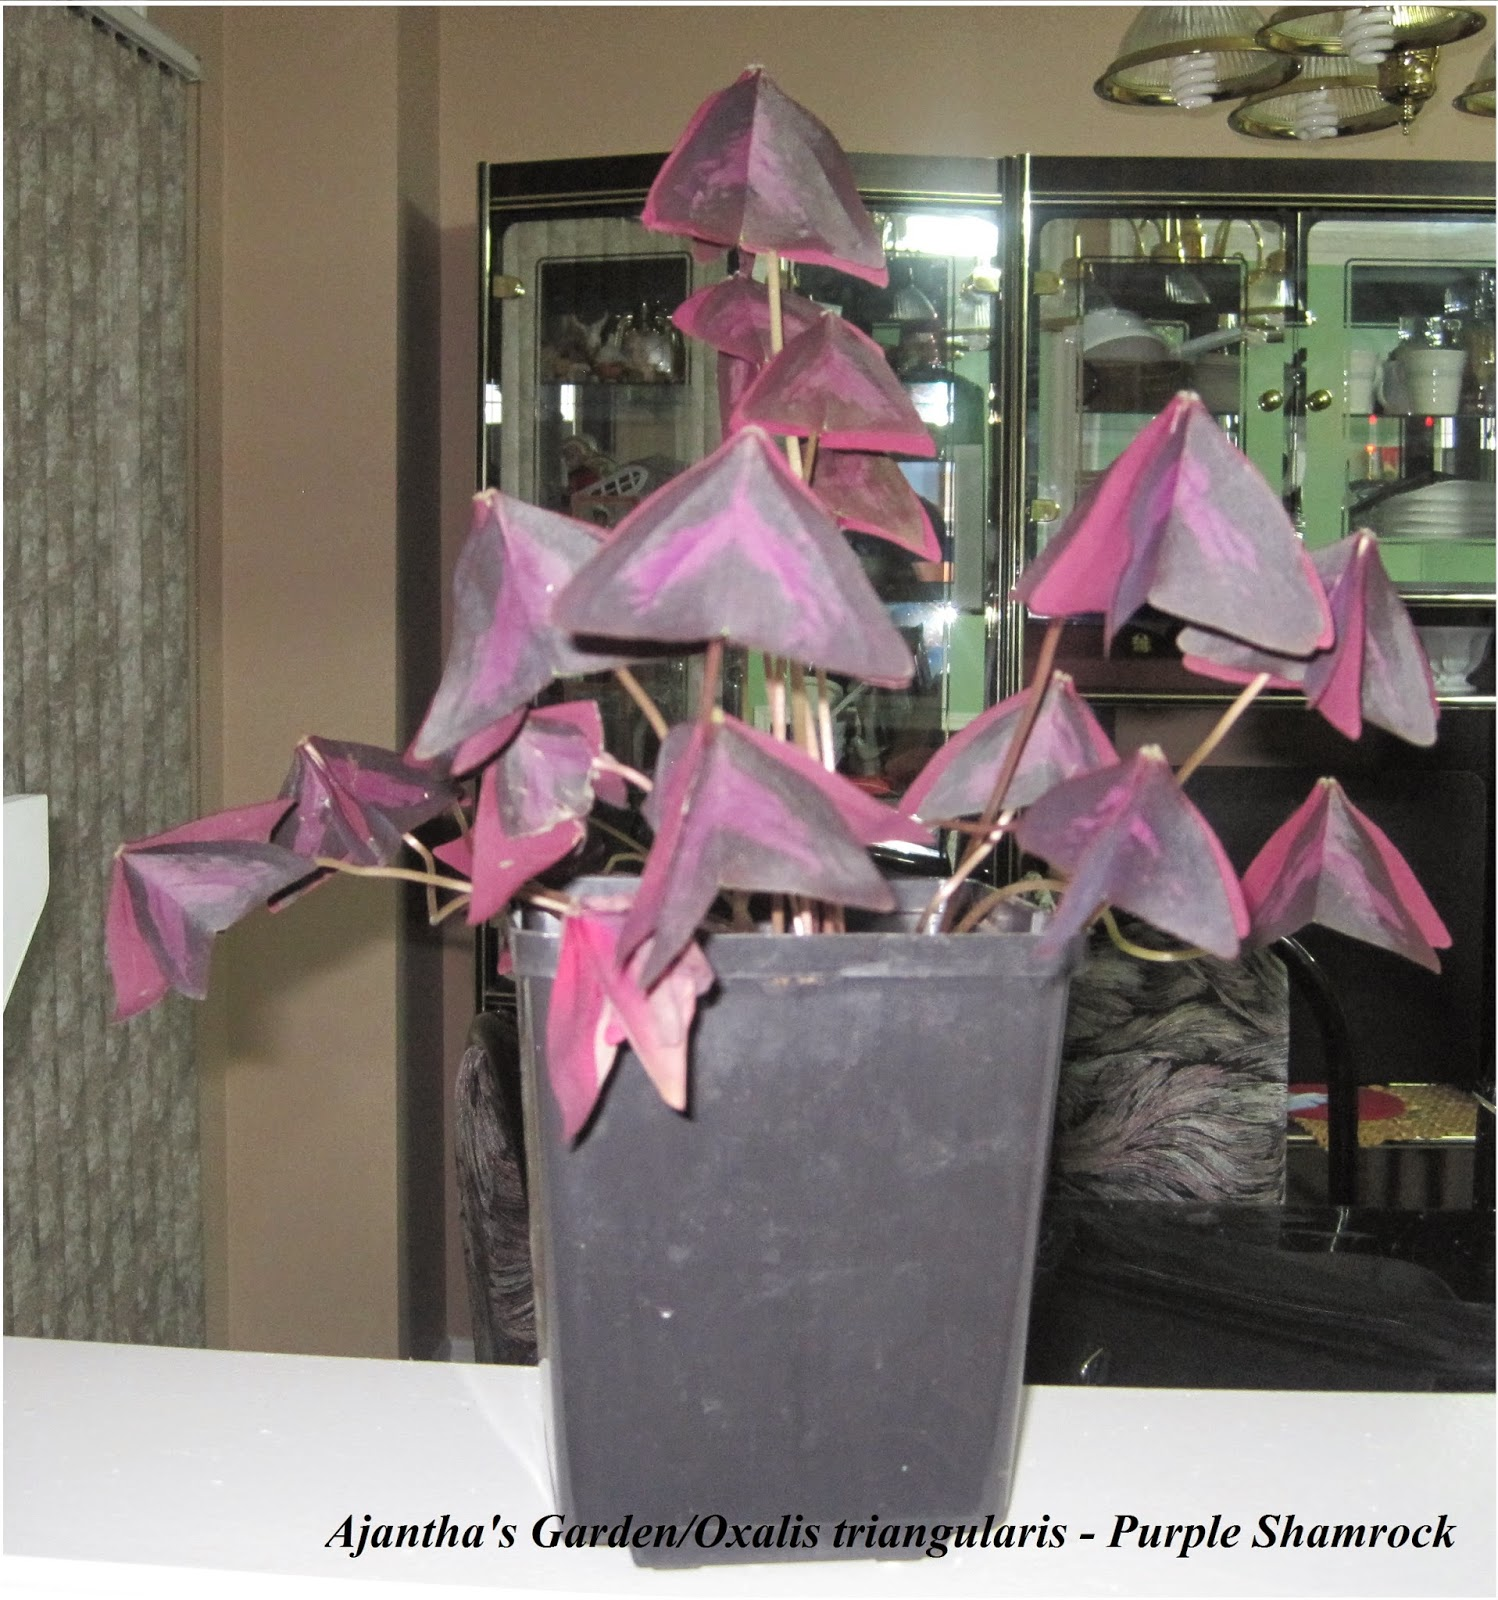 Ajantha's Garden/Oxalic triangularis - Purple Shamrock